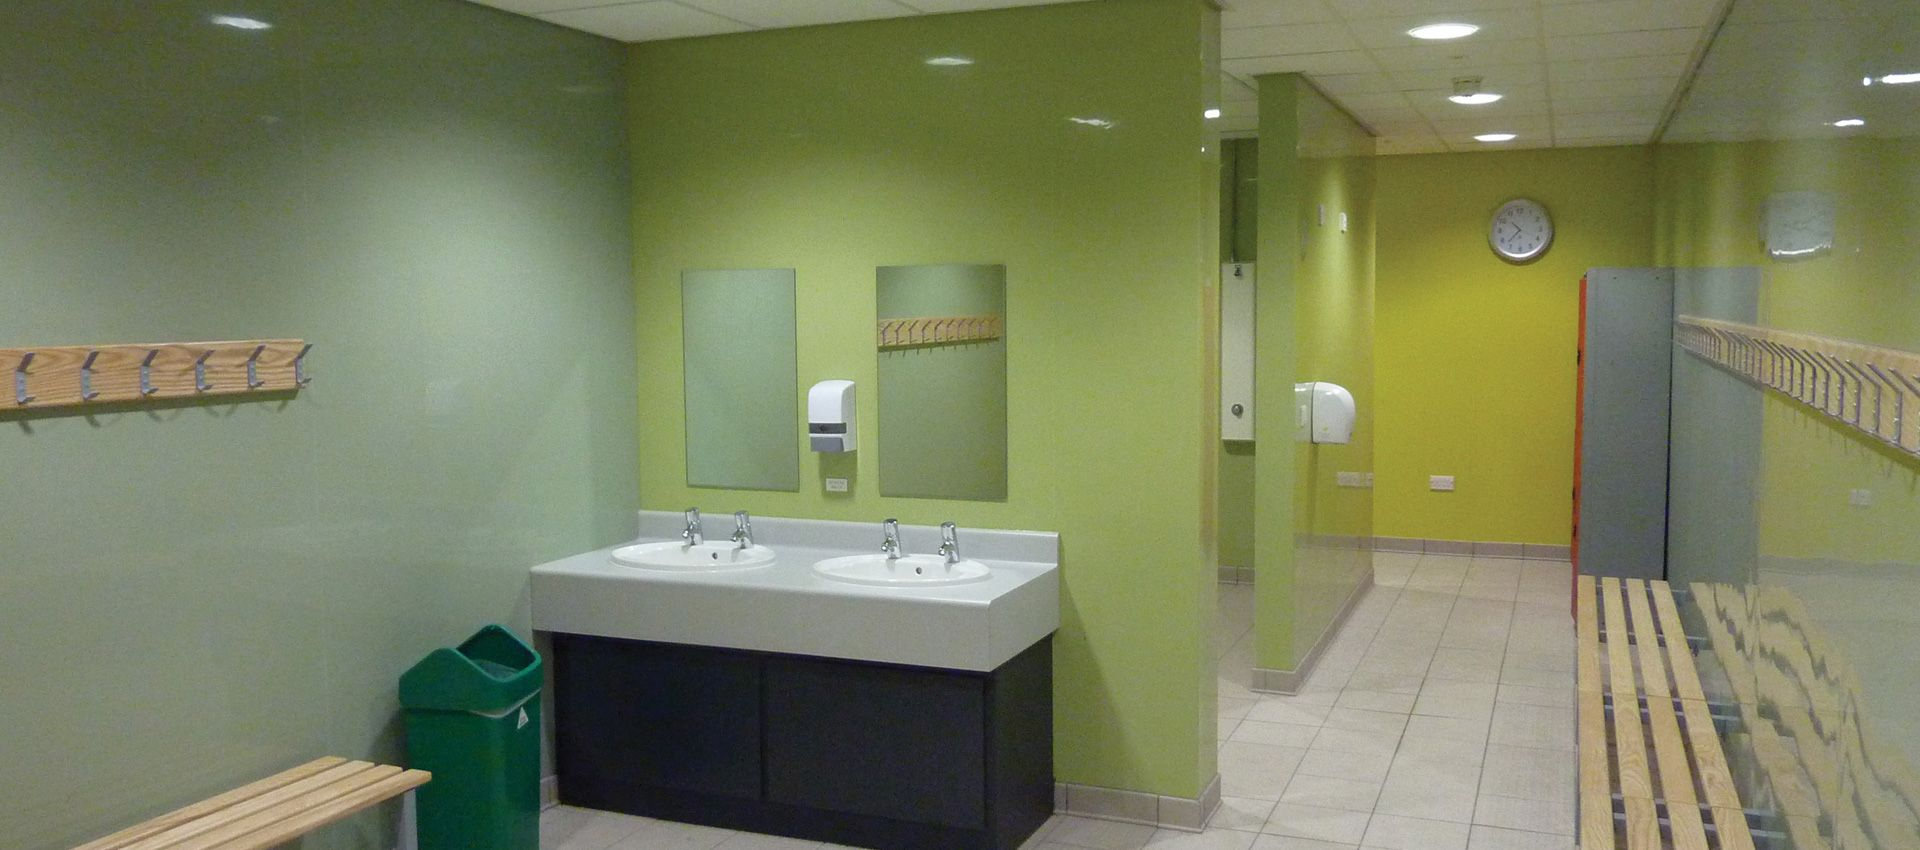 Hygienic Wall Cladding Wall Cladding Shower Wall Panels Pvc Cladding